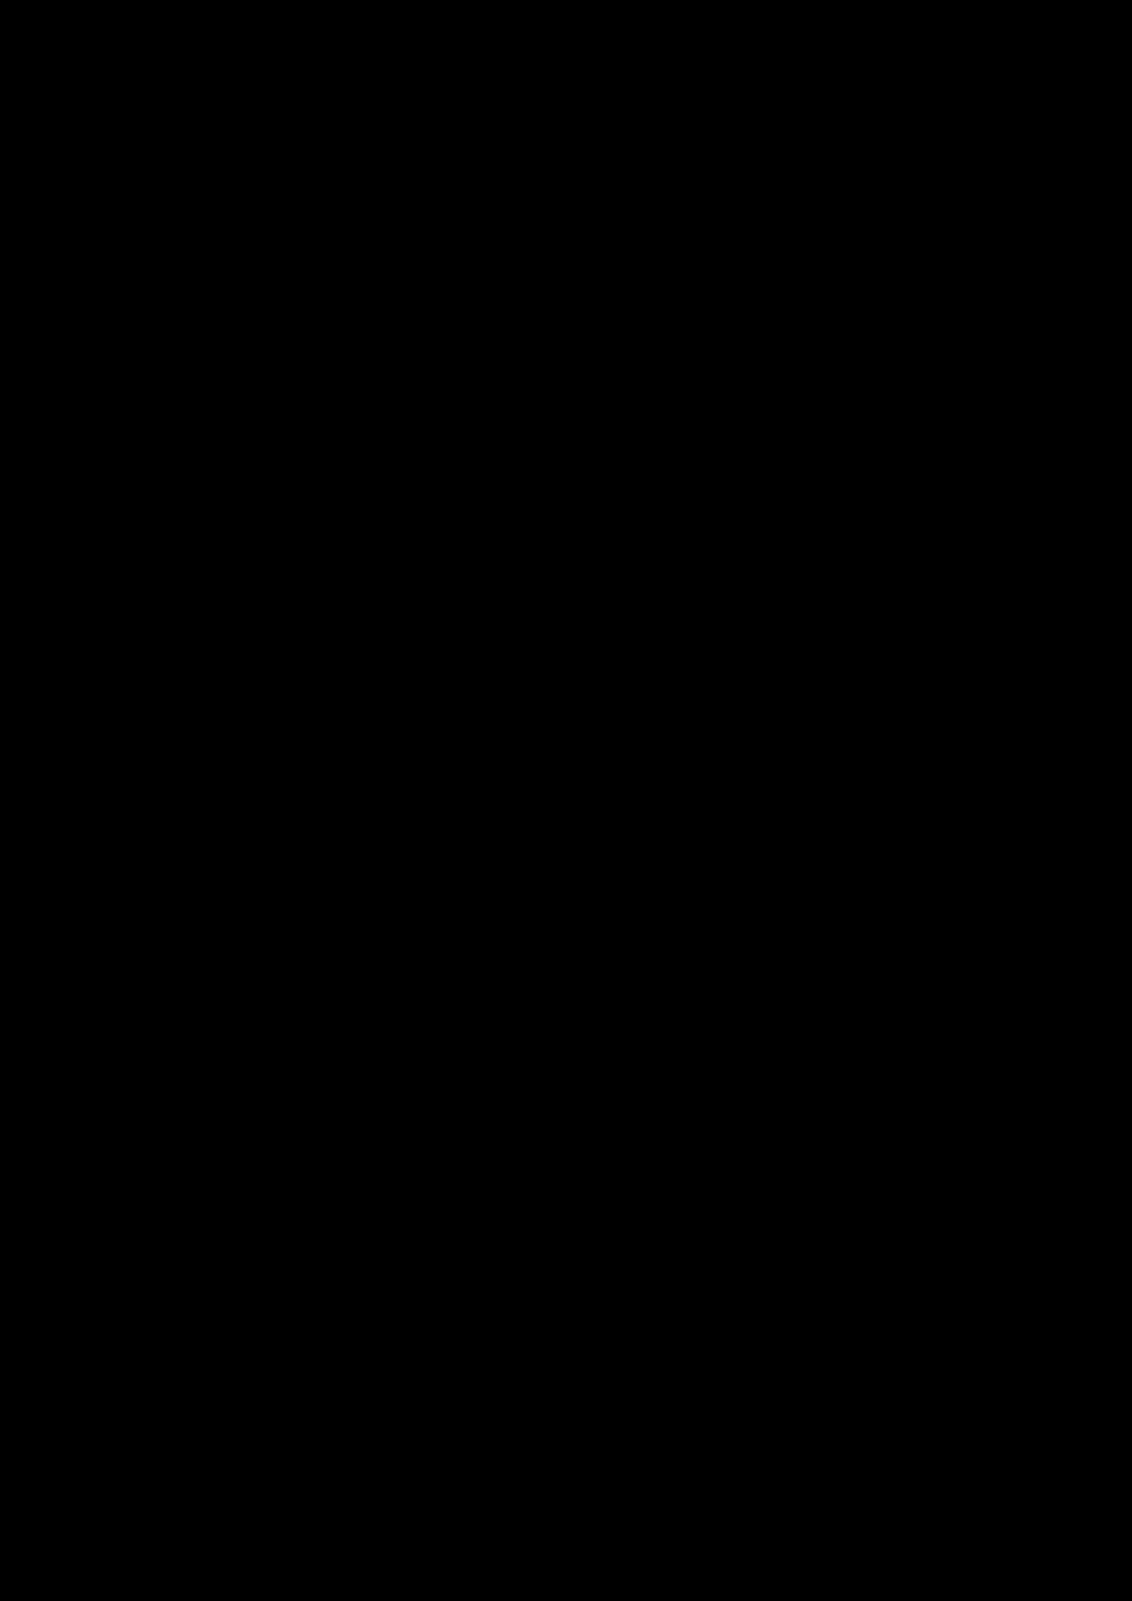 Korolevstvo slez slide, Image 79